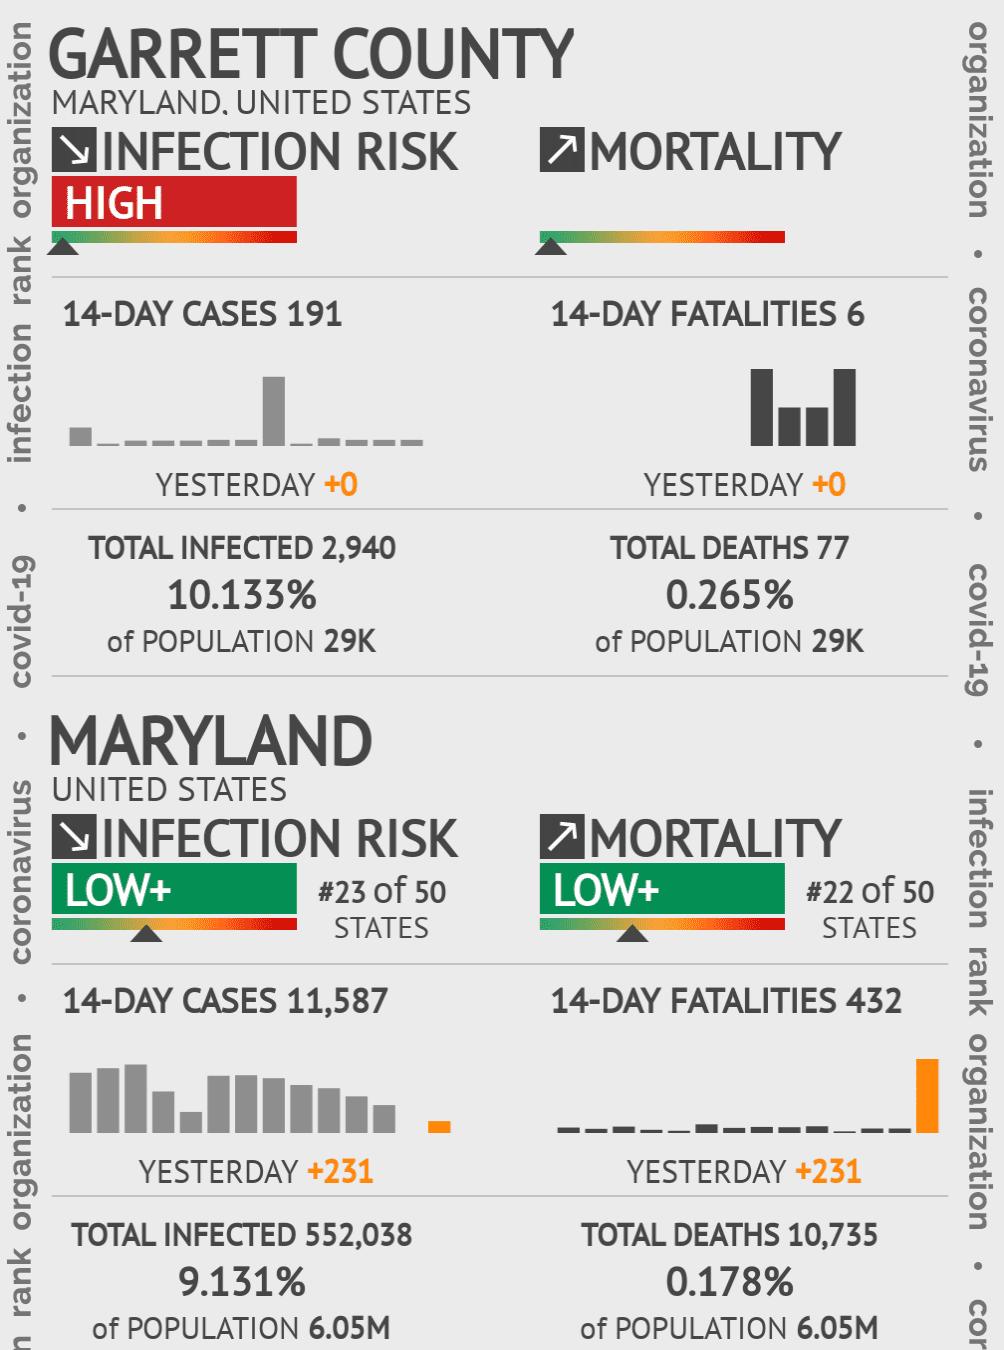 Garrett County Coronavirus Covid-19 Risk of Infection on July 24, 2021